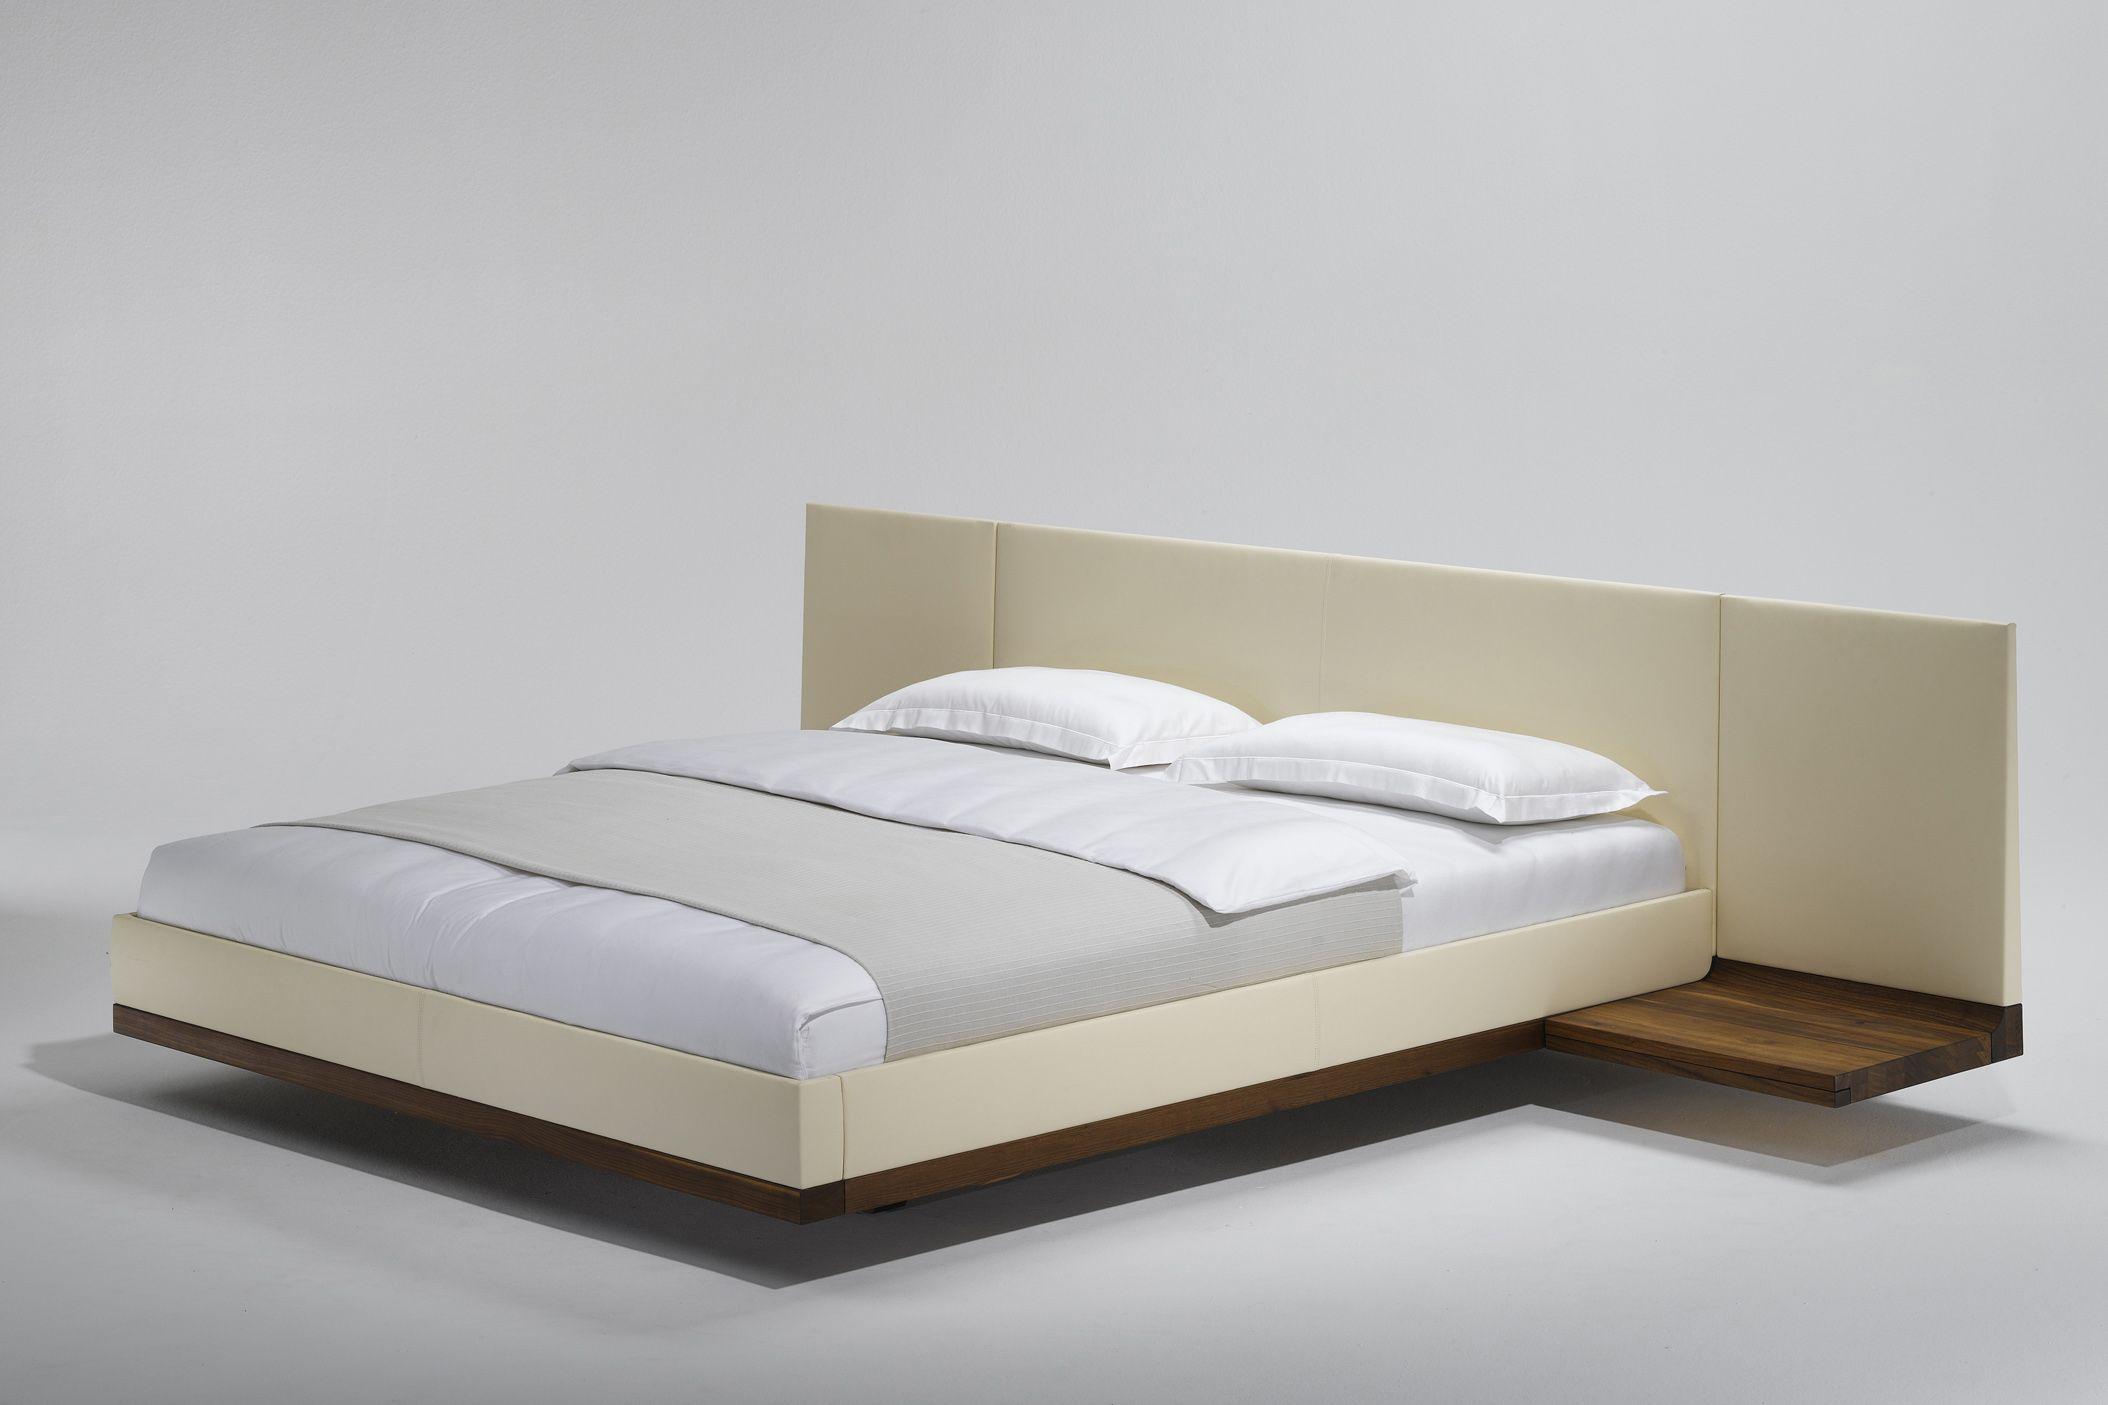 Riletto Team 7 Bett | Furniture | Pinterest